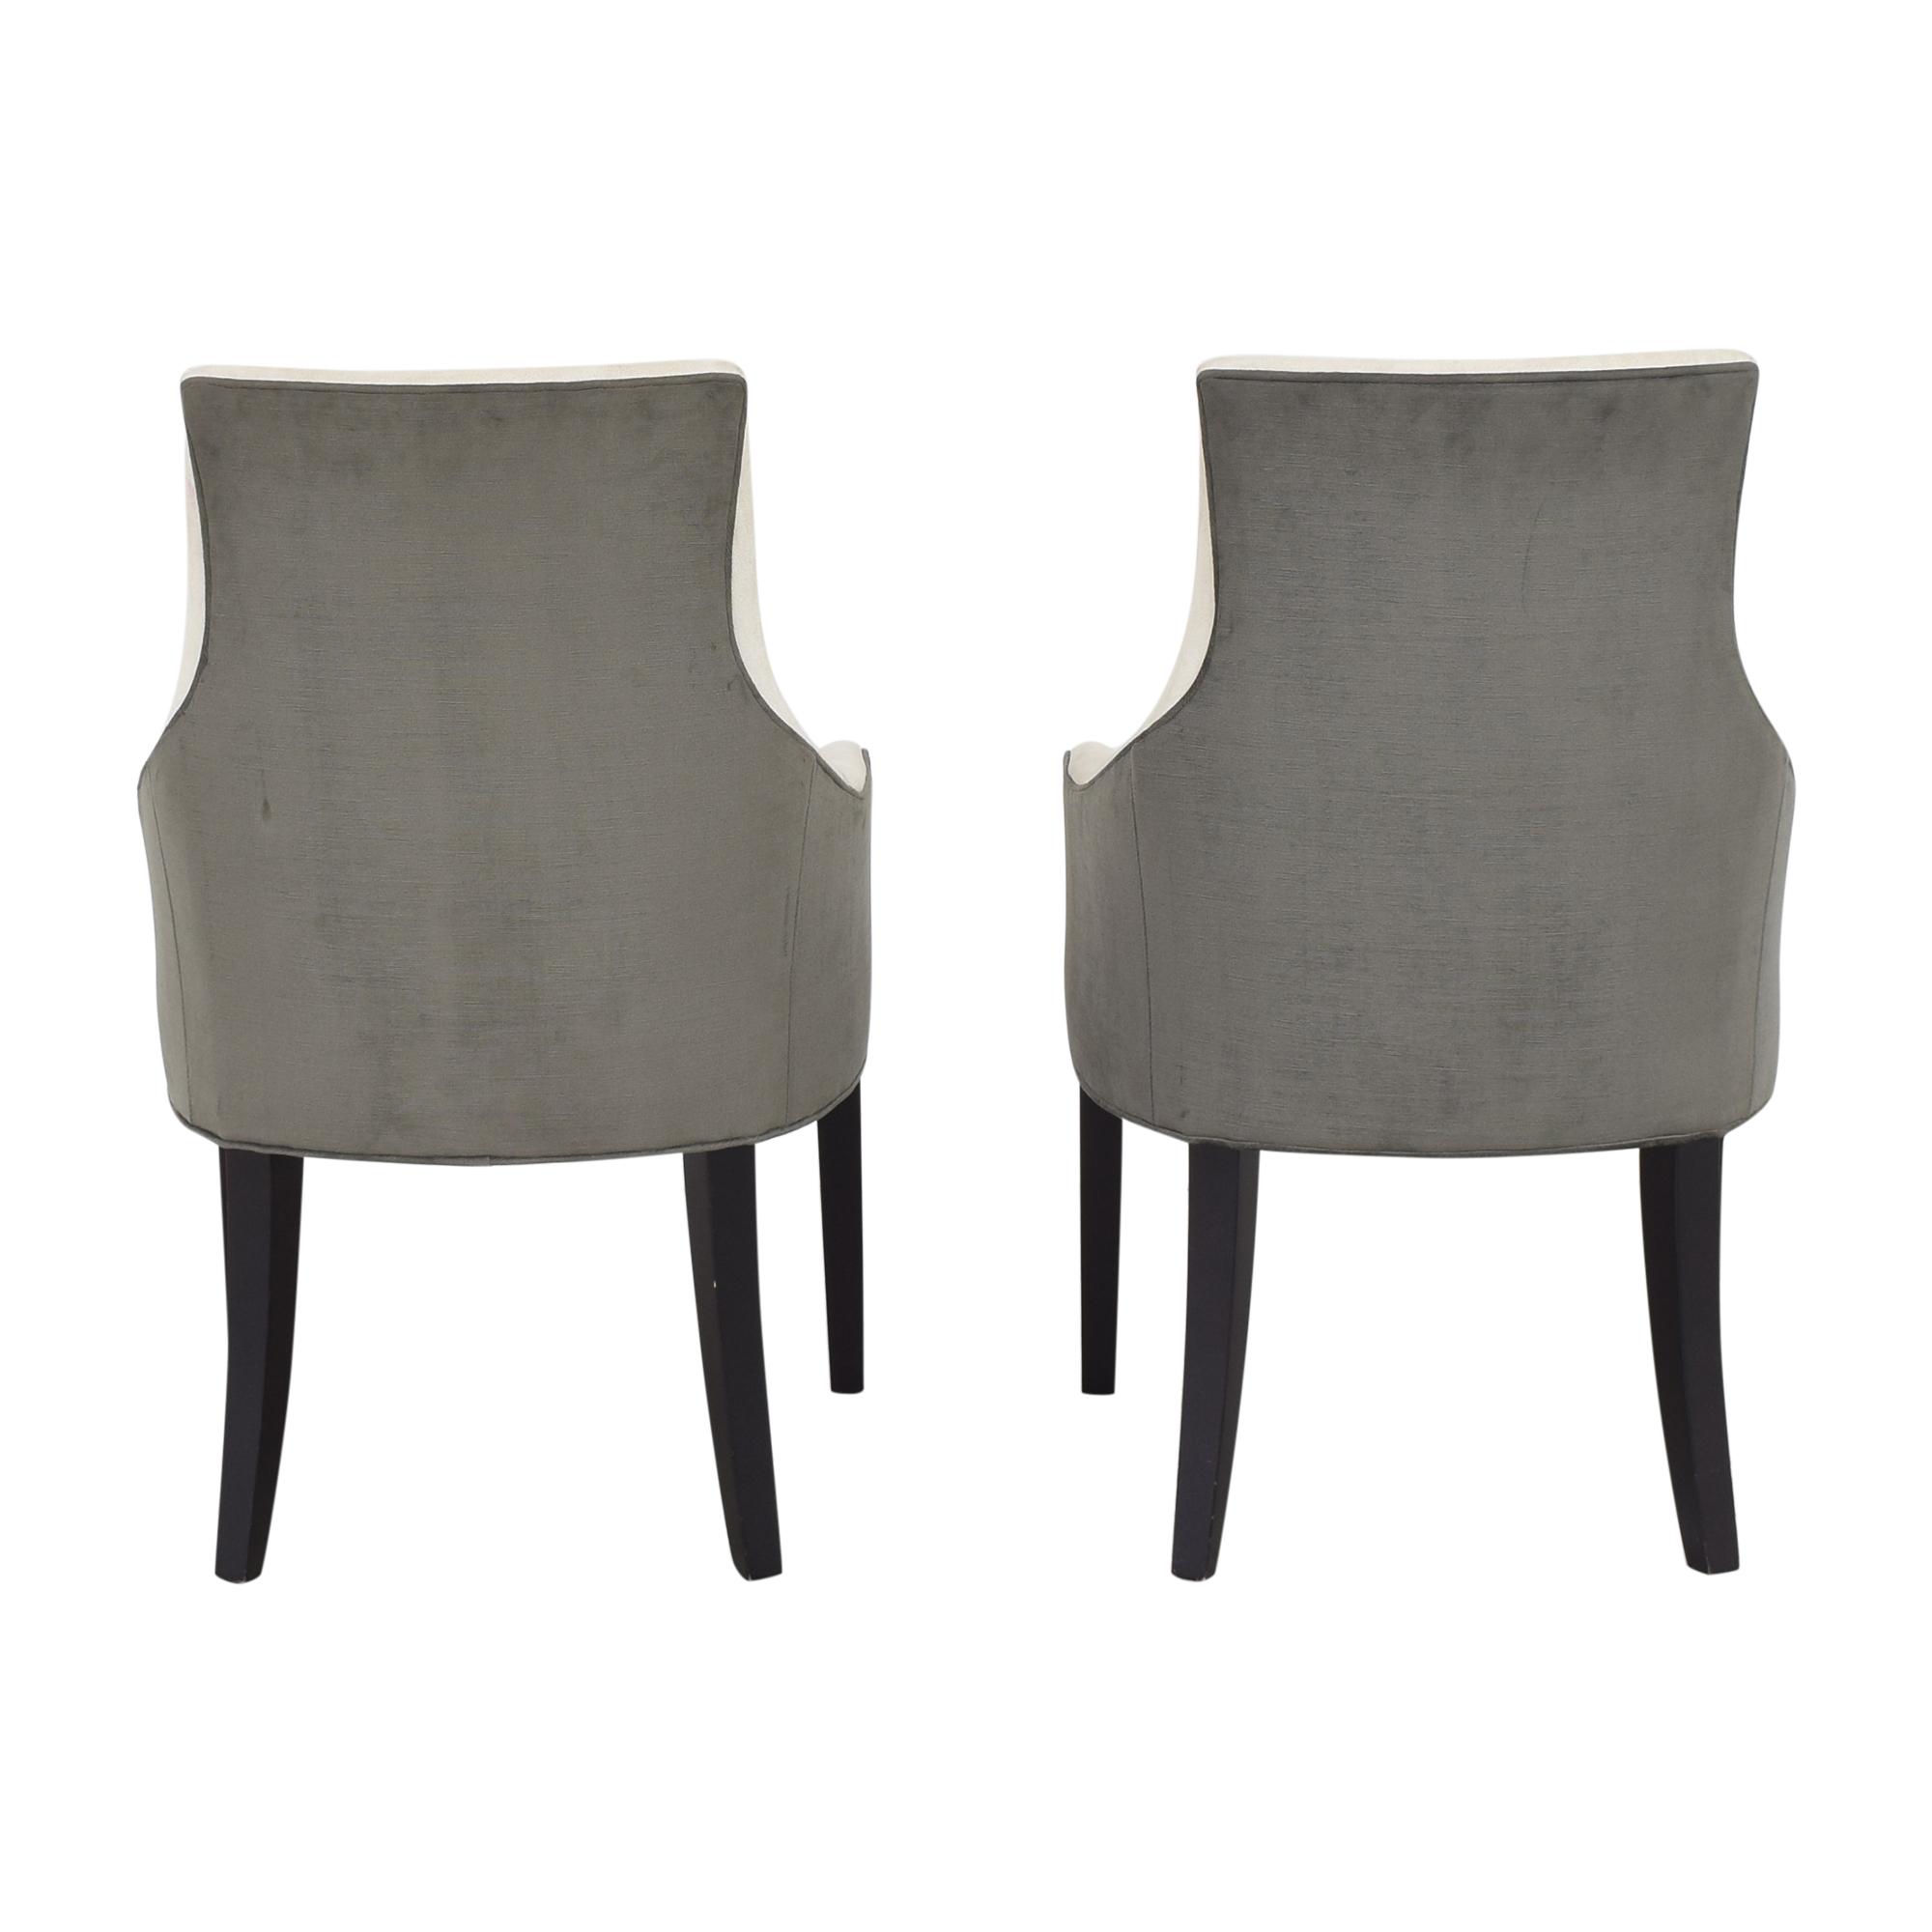 shop Mitchell Gold + Bob Williams Mitchell Gold + Bob Williams Ada Dining Arm Chairs online